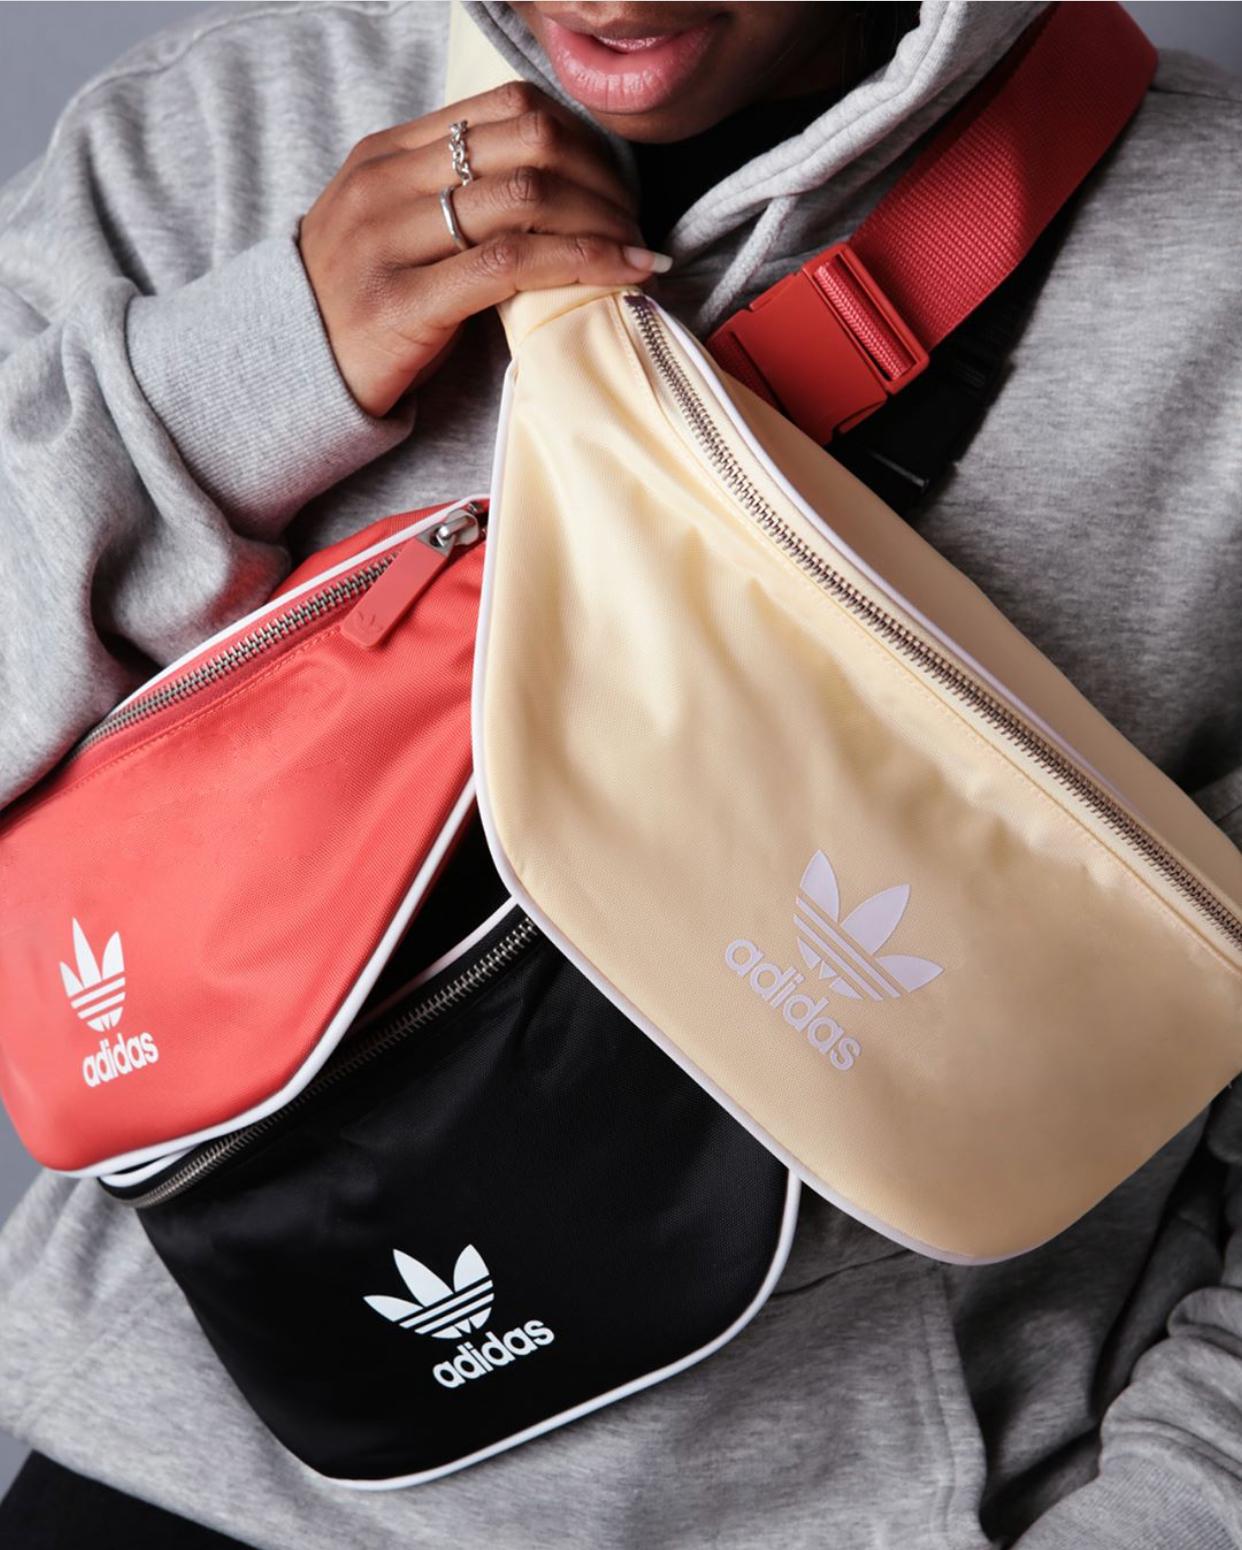 Get Fitted With The Adidas Originals Waist Bag — CNK DailyChicksNKicks 097f4022d4b44